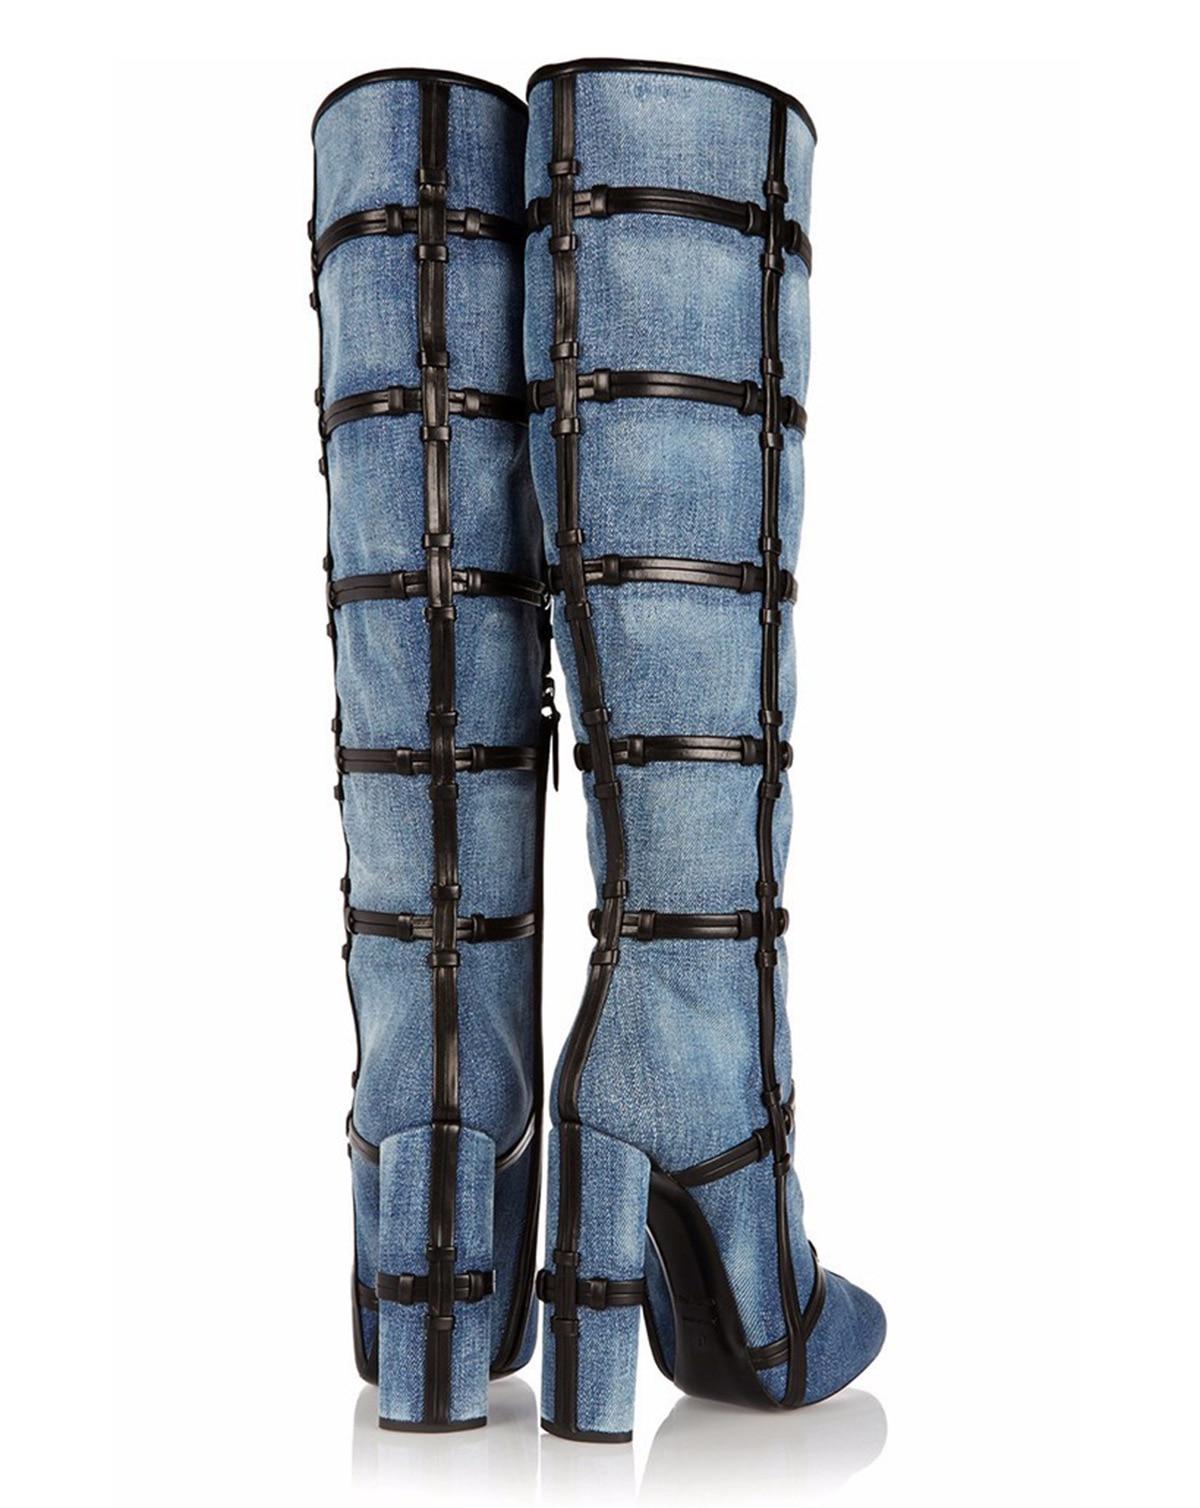 Talón Nudo Stiletto Sexy Moda Vaquero Alta De Botas Estilo Calle Retro Gruesos Negro Zapatos Rodilla Tacones Mujer Mezclilla Larga Cruz Azul 5qwFwf6